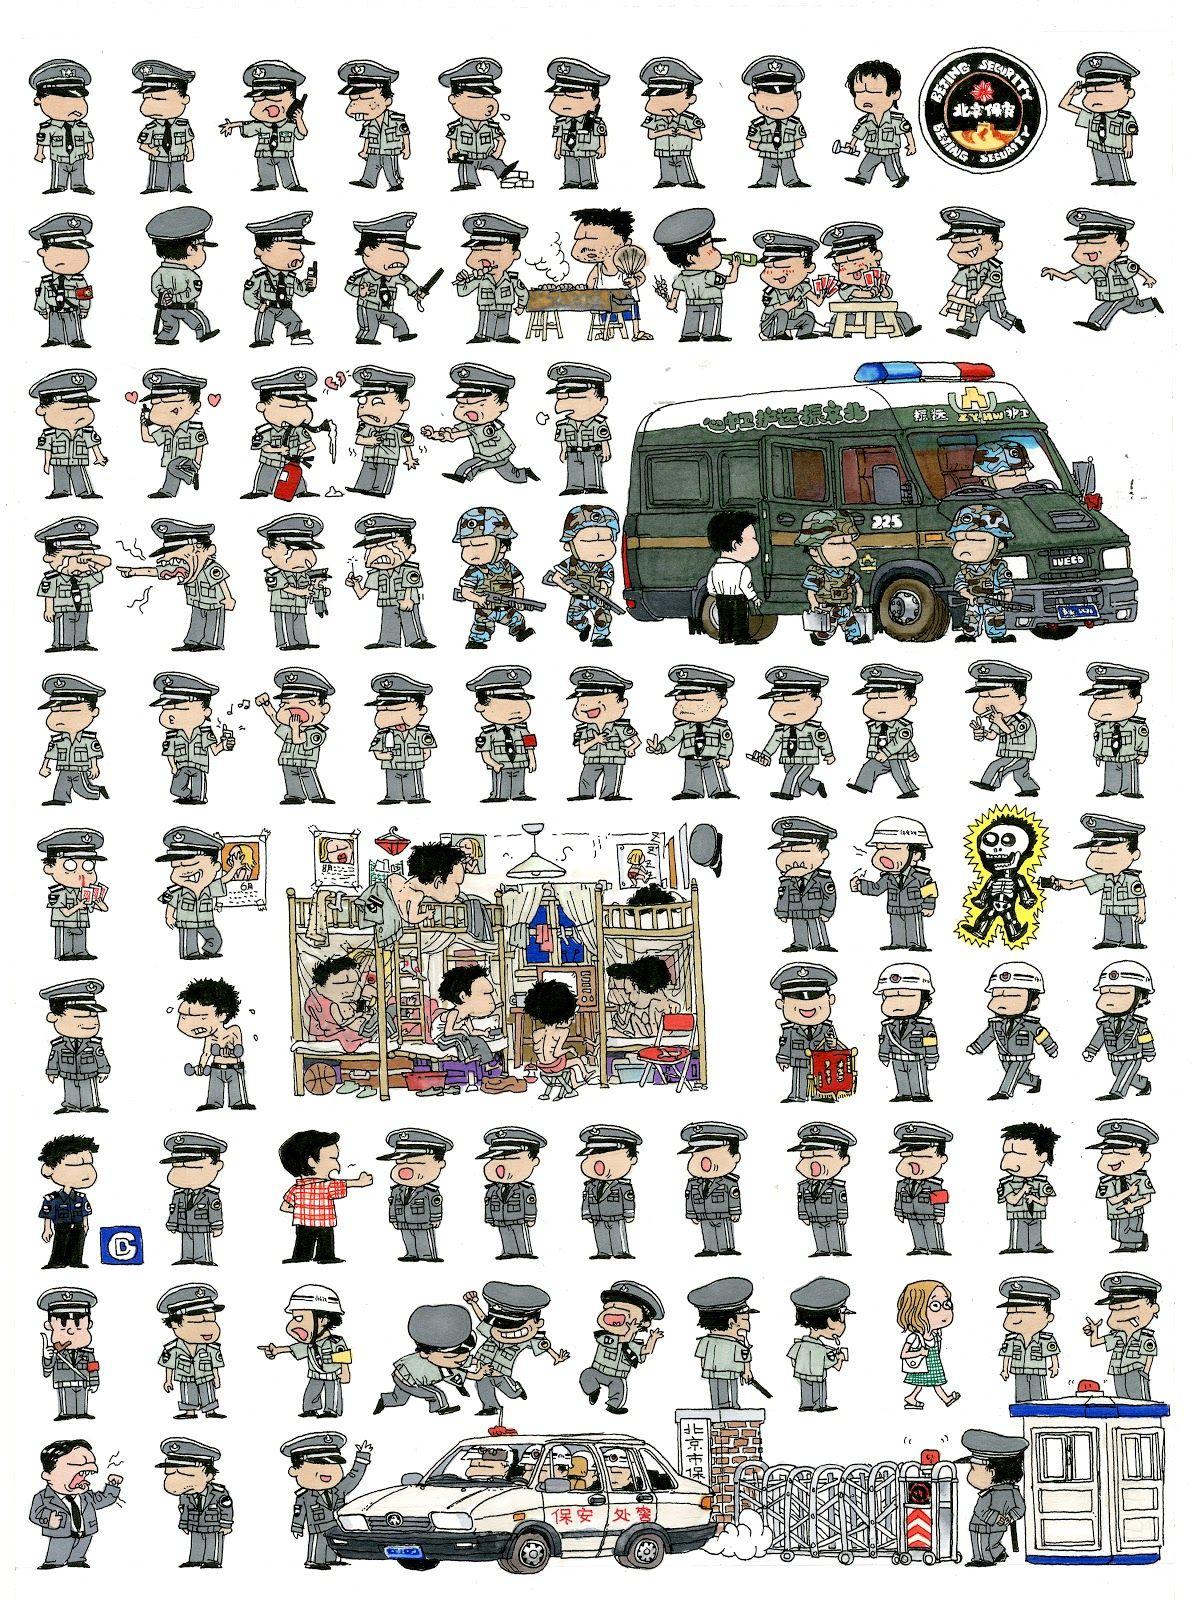 Modern Chinese Police Cartoon Figures Military Drawings Military Art War Artwork